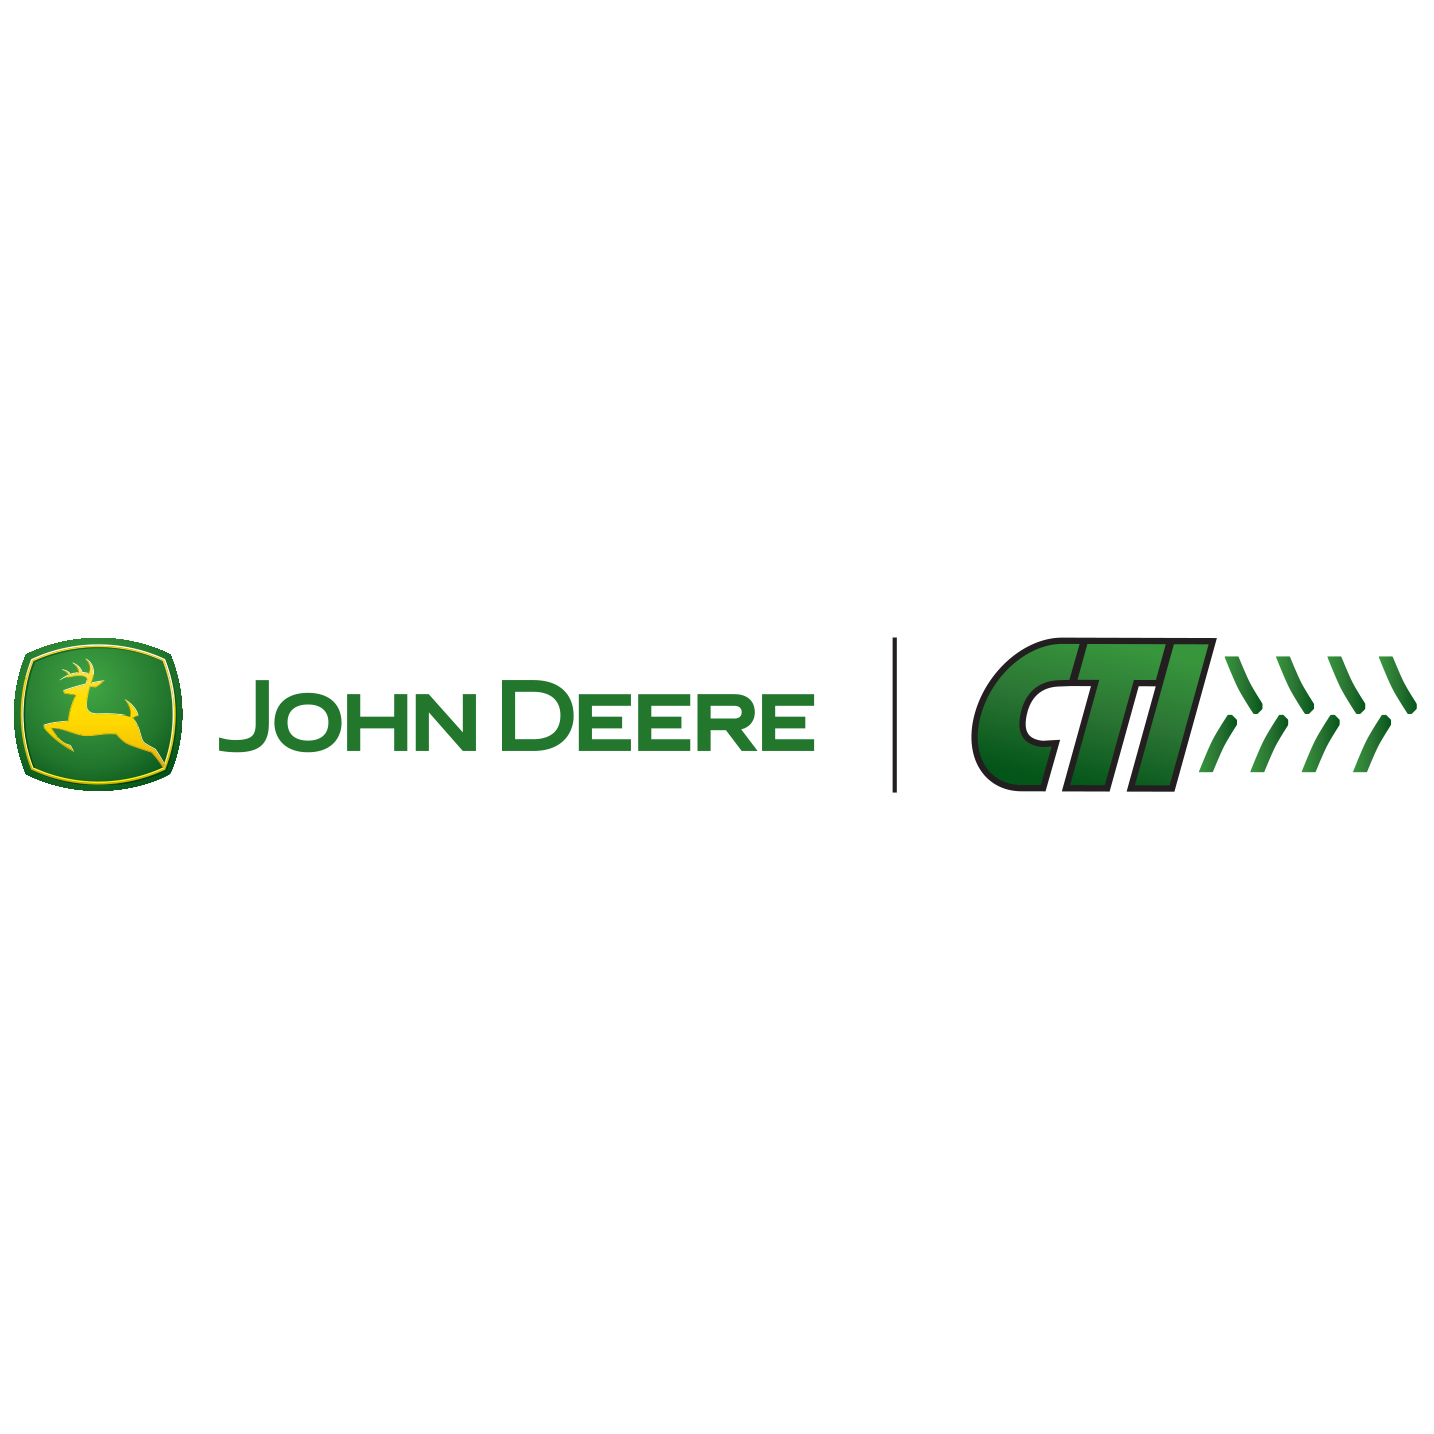 CTI John Deere